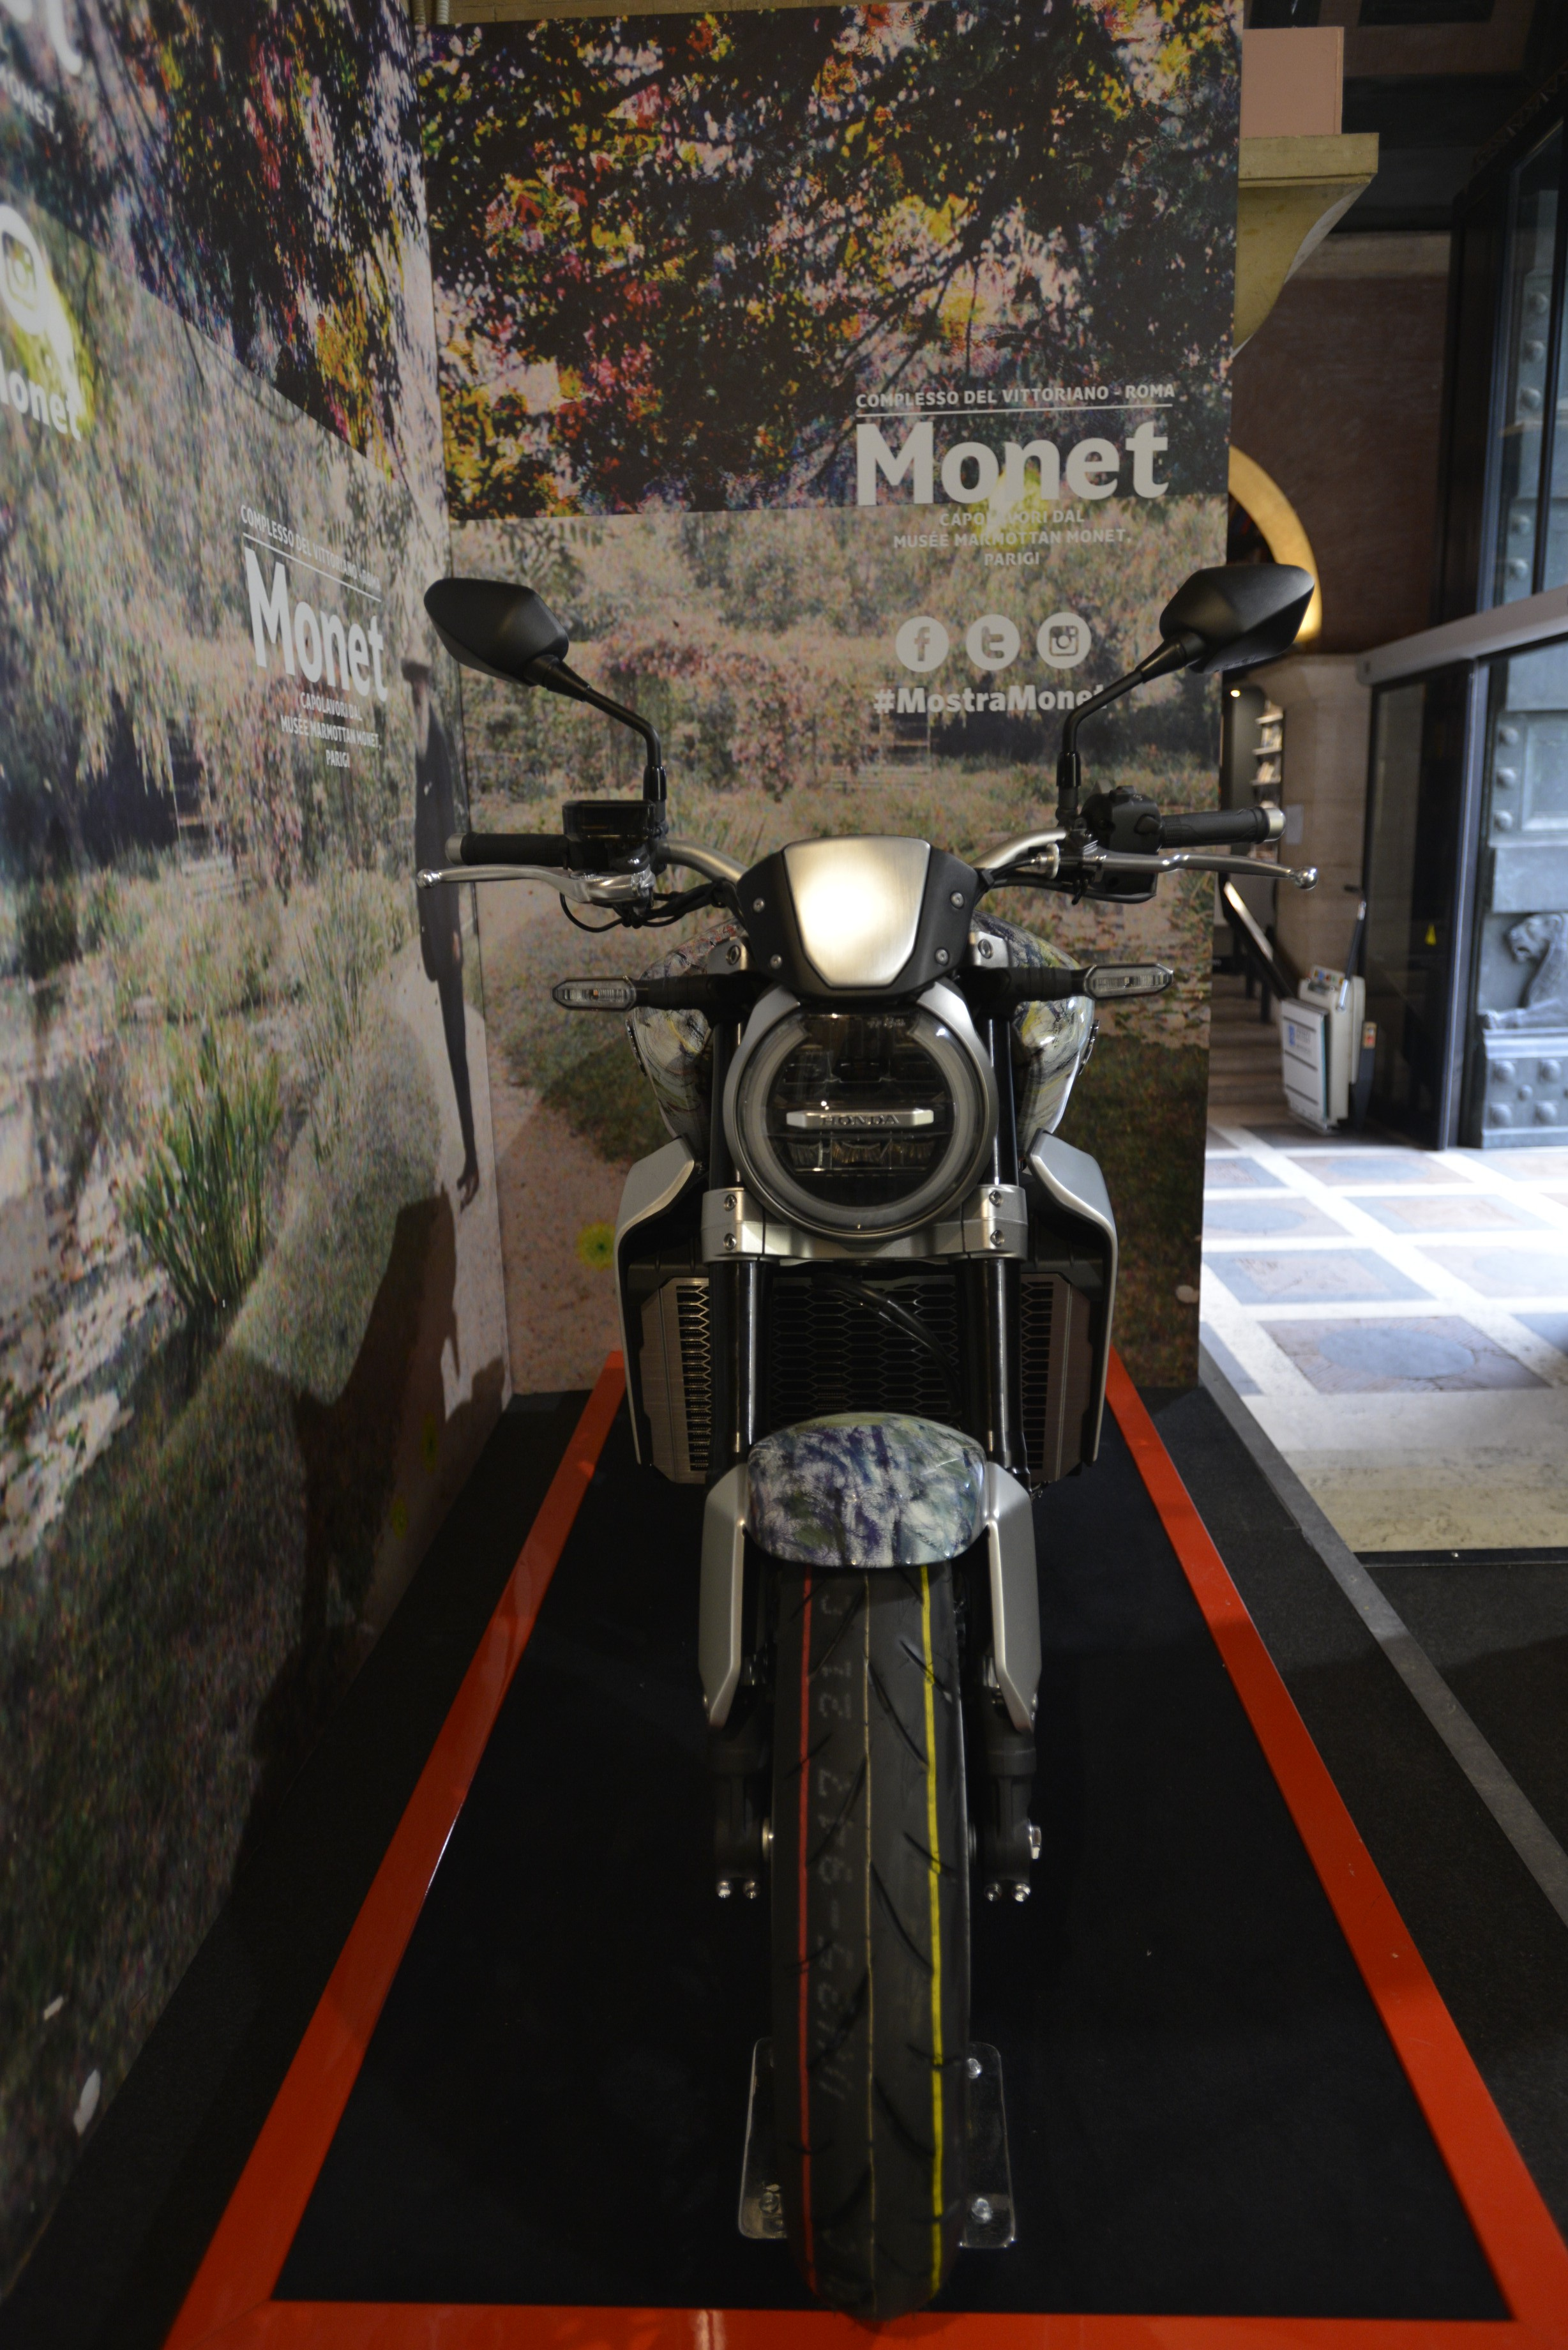 004 -Honda Monet foto iskra coronelli per Arthemisia-2018